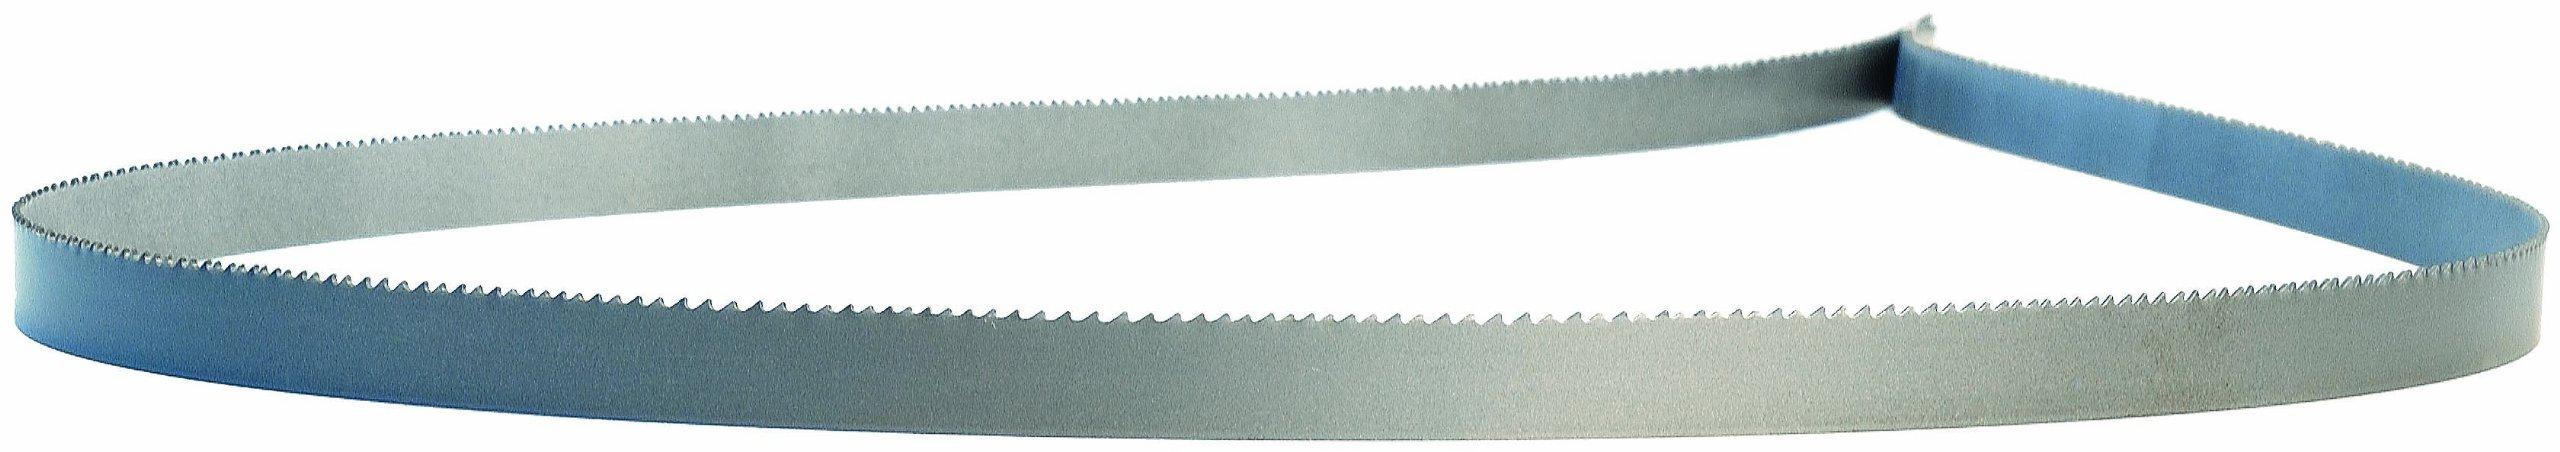 Lenox Diemaster 2 Band Saw Blade, Bimetal, Regular Tooth, Wavy Set, Positive Rake, 64.5'' Length, 1/2'' Width, 0.025'' Thick, 14-18 TPI